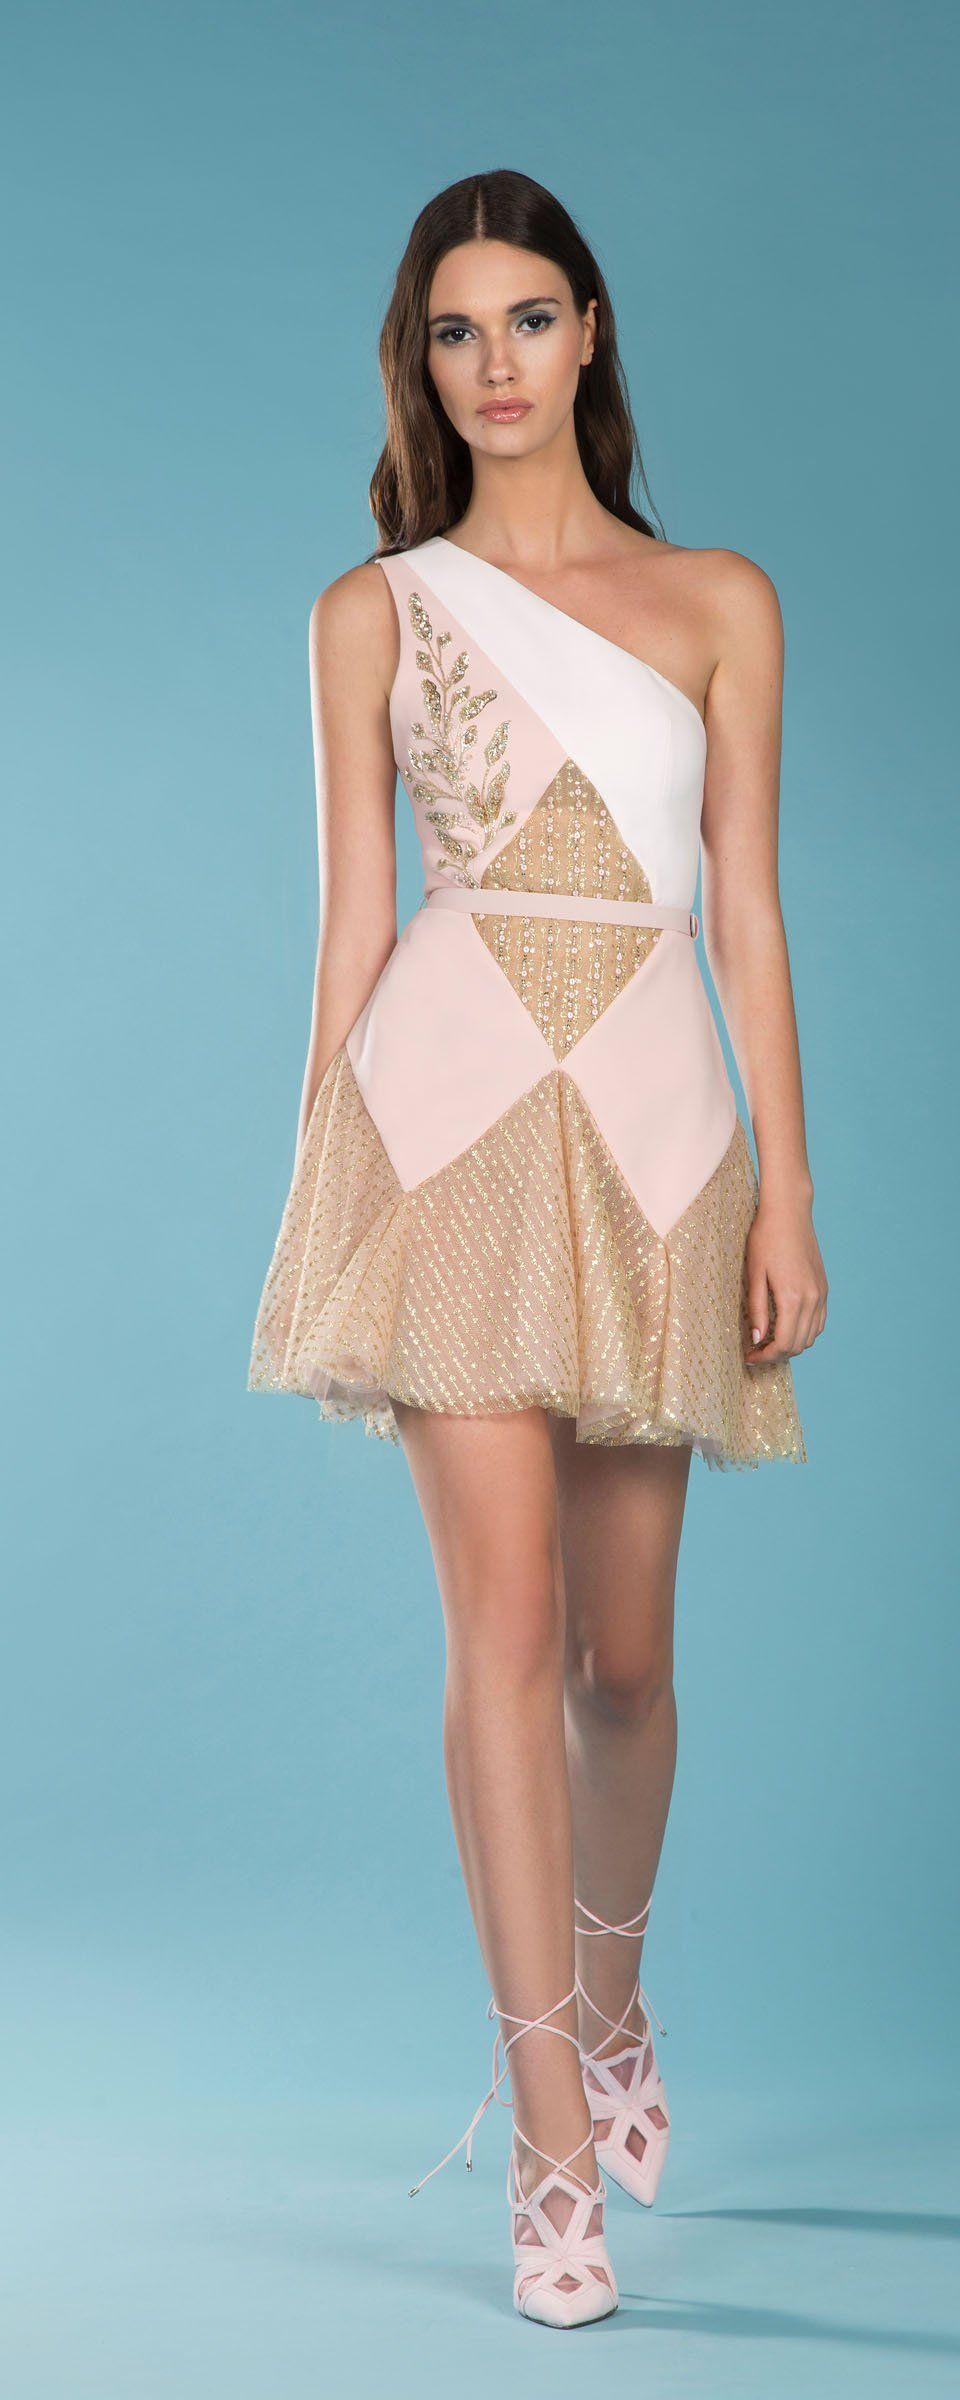 Lace off shoulder wedding dress august 2019 Georges Hobeika Resort   ReadytoWear    Pinterest